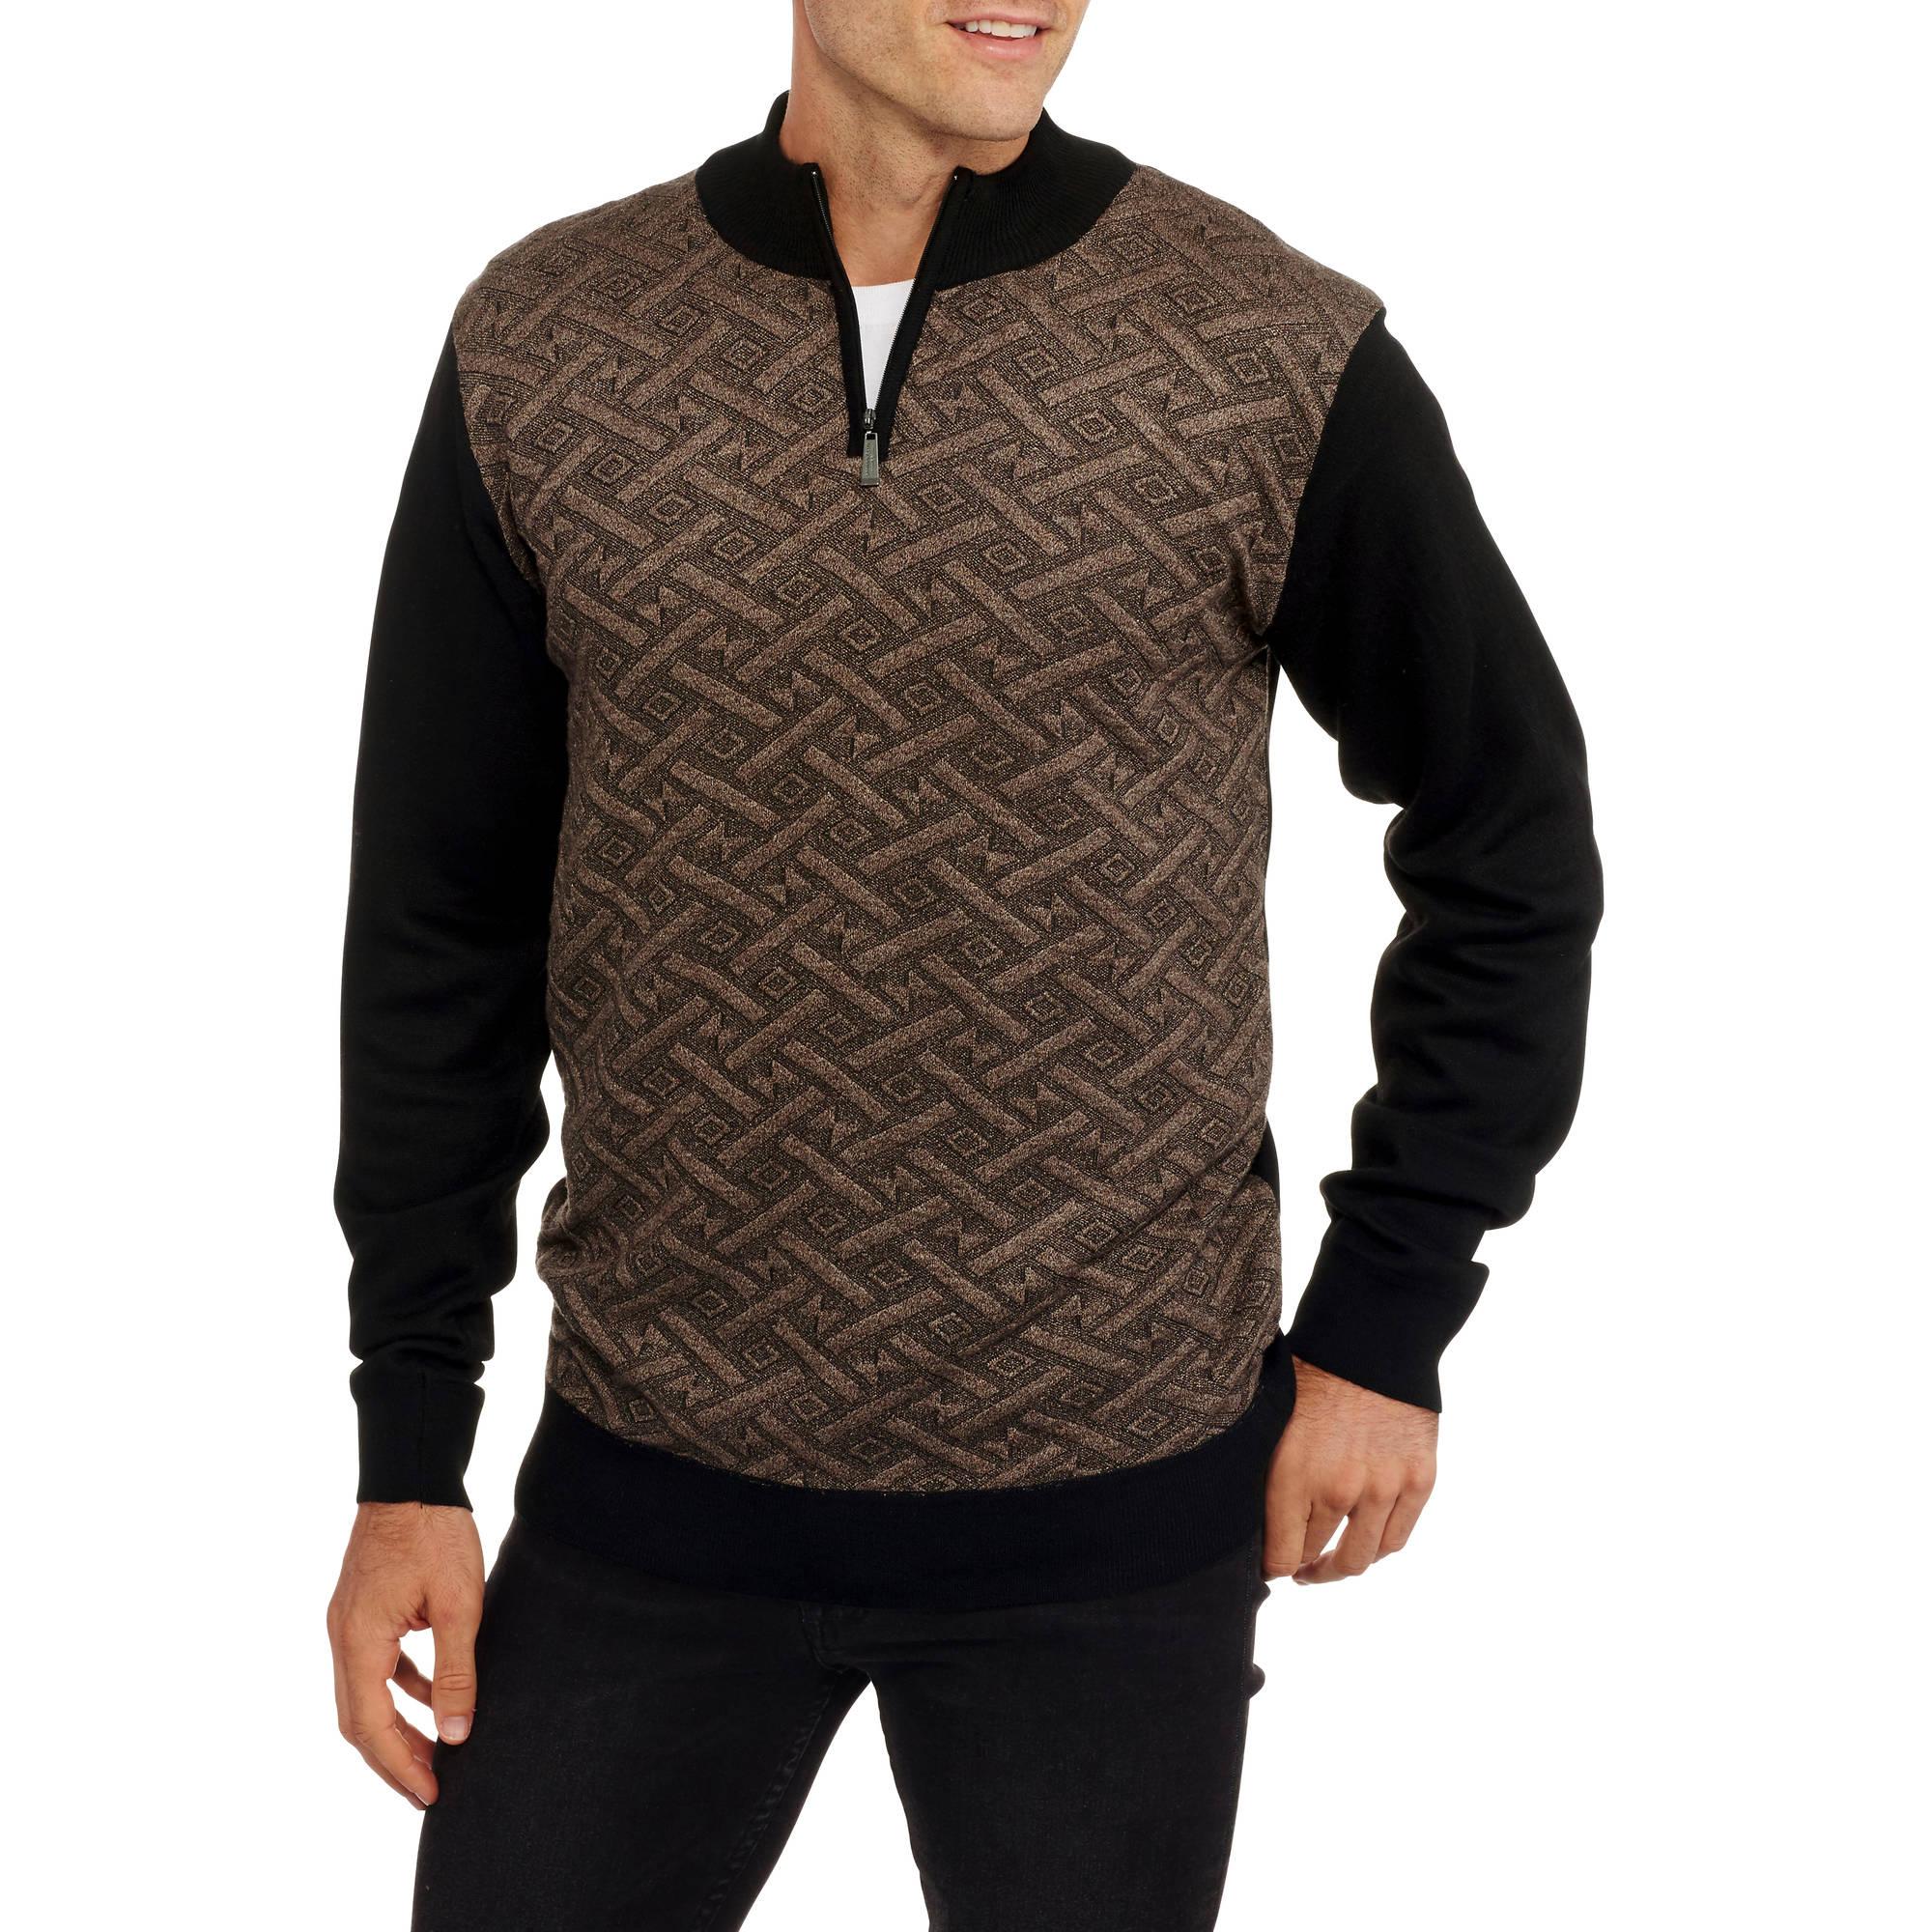 Sahara Club Men's Jacquard 1/4 Zip Mock Neck Sweater